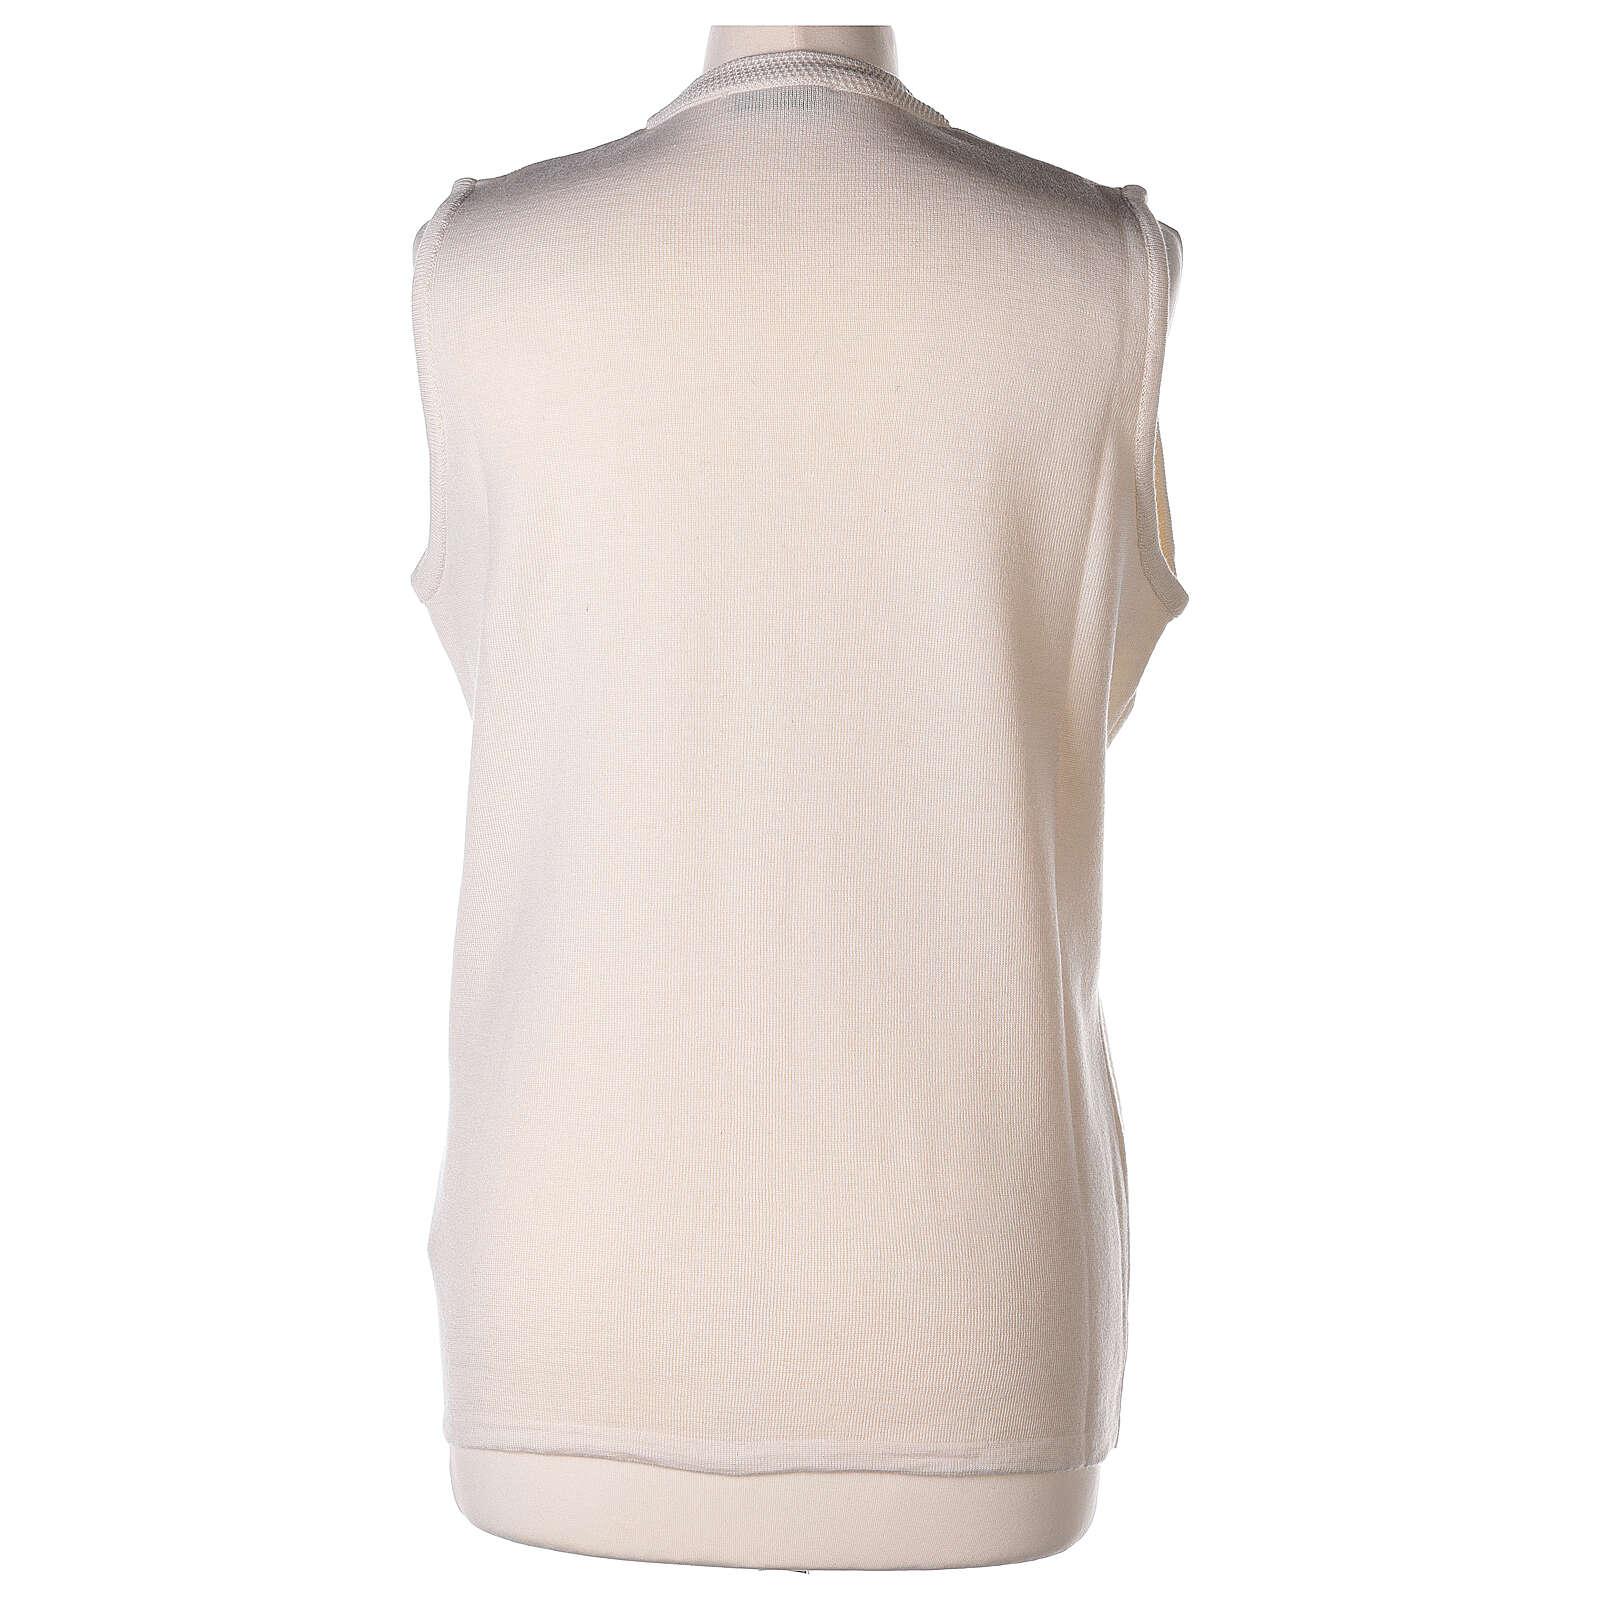 Gilet blanc soeur avec poches col en V GRANDE TAILLE 50% acrylique 50% mérinos In Primis 4